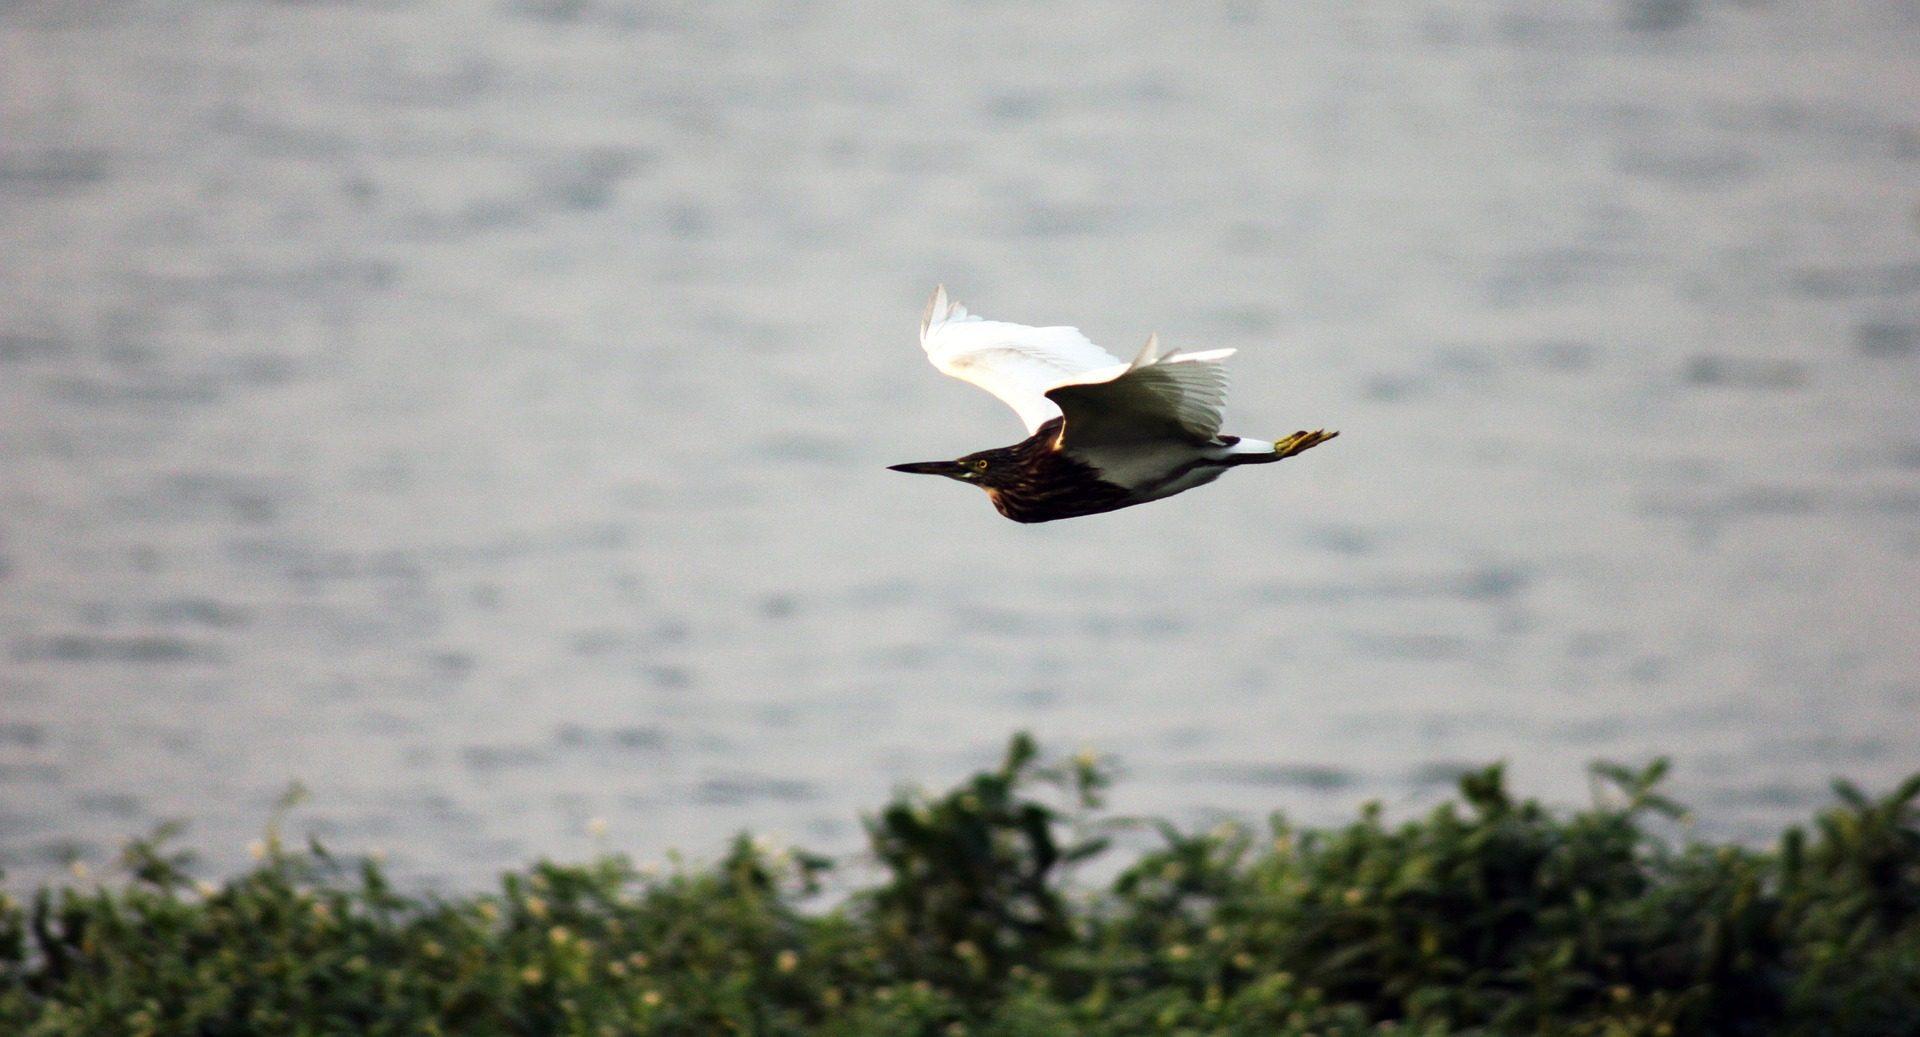 पक्षी, Ave, उड़ान, गति, स्वतंत्रता - HD वॉलपेपर - प्रोफेसर-falken.com